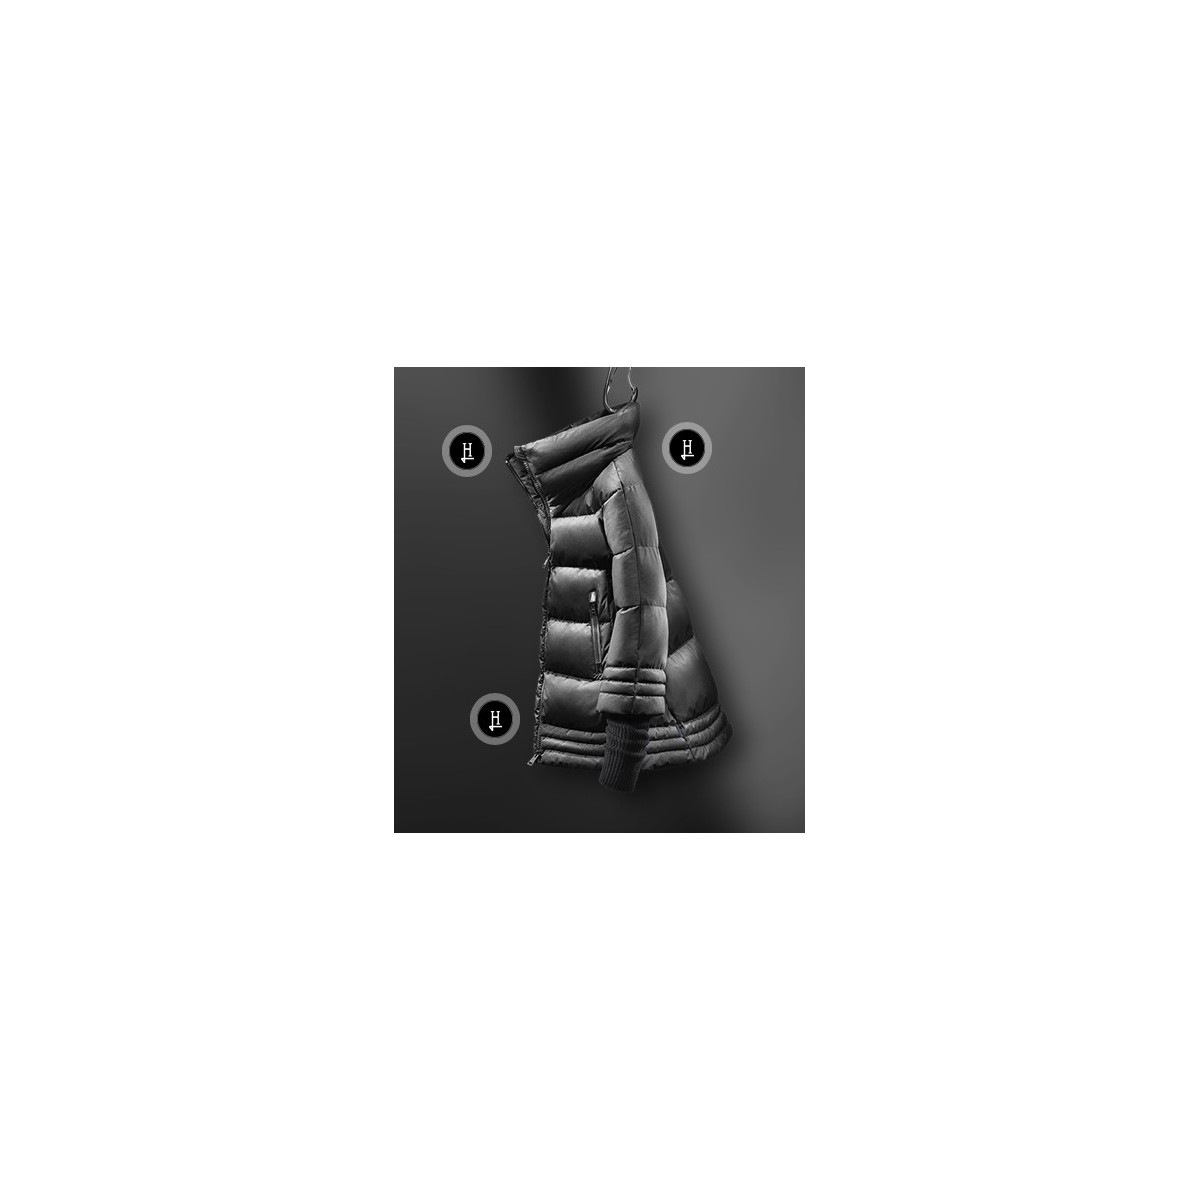 Piumino - Pi067dl 11106 kappa laminar